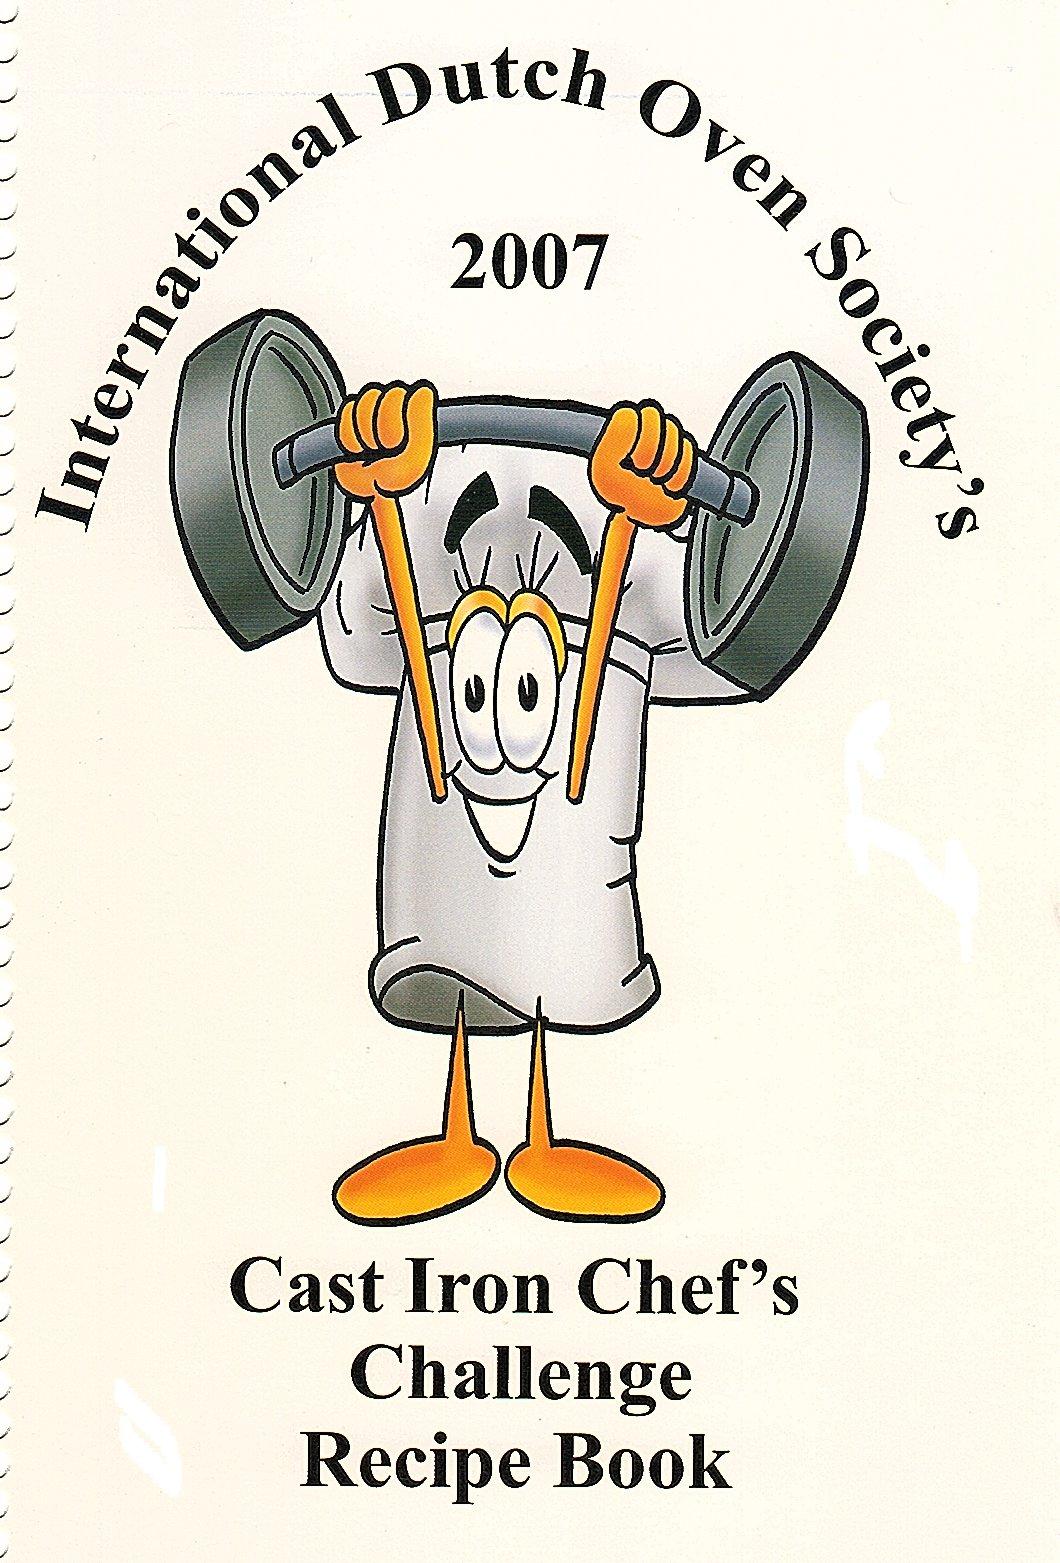 International Dutch Oven Society World Championship Cook-Off 2007